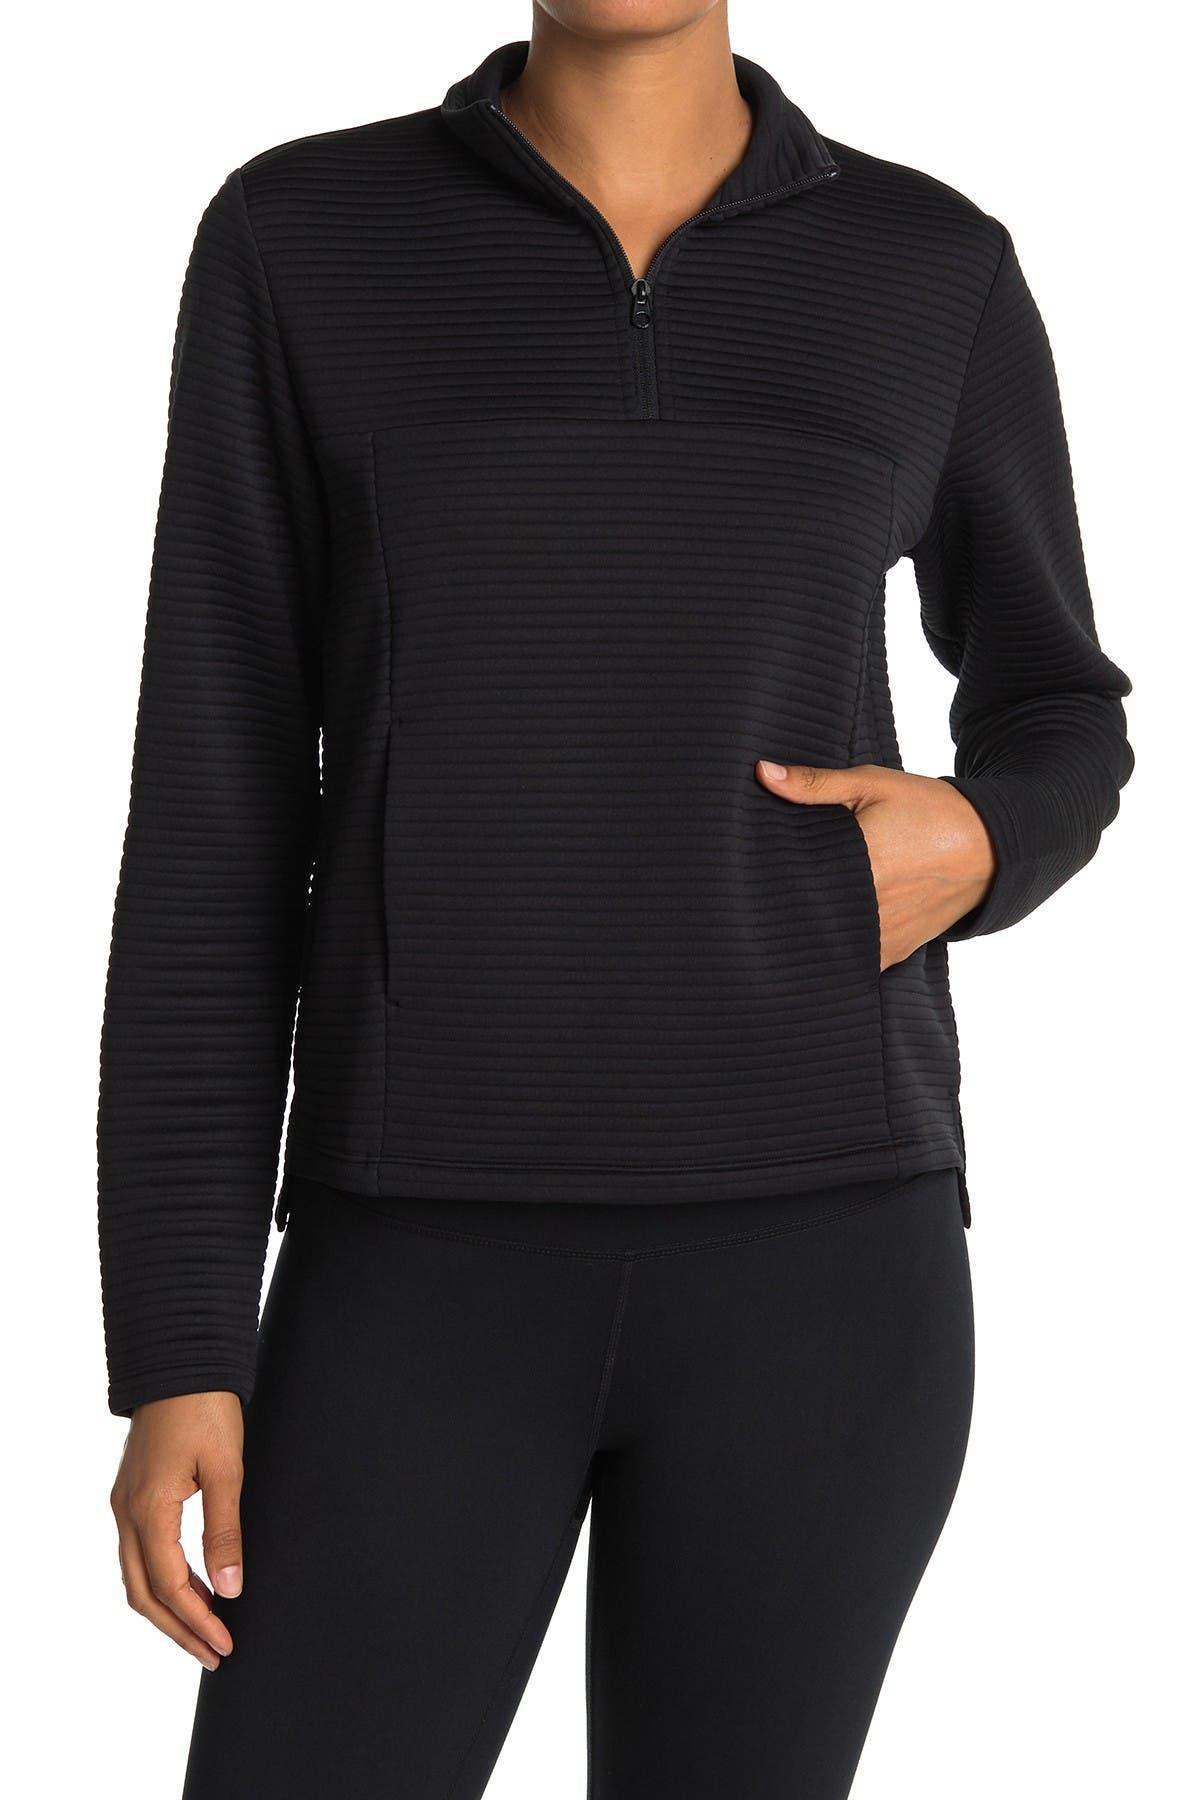 Image of Z By Zella Evolve Half Zip Sweater